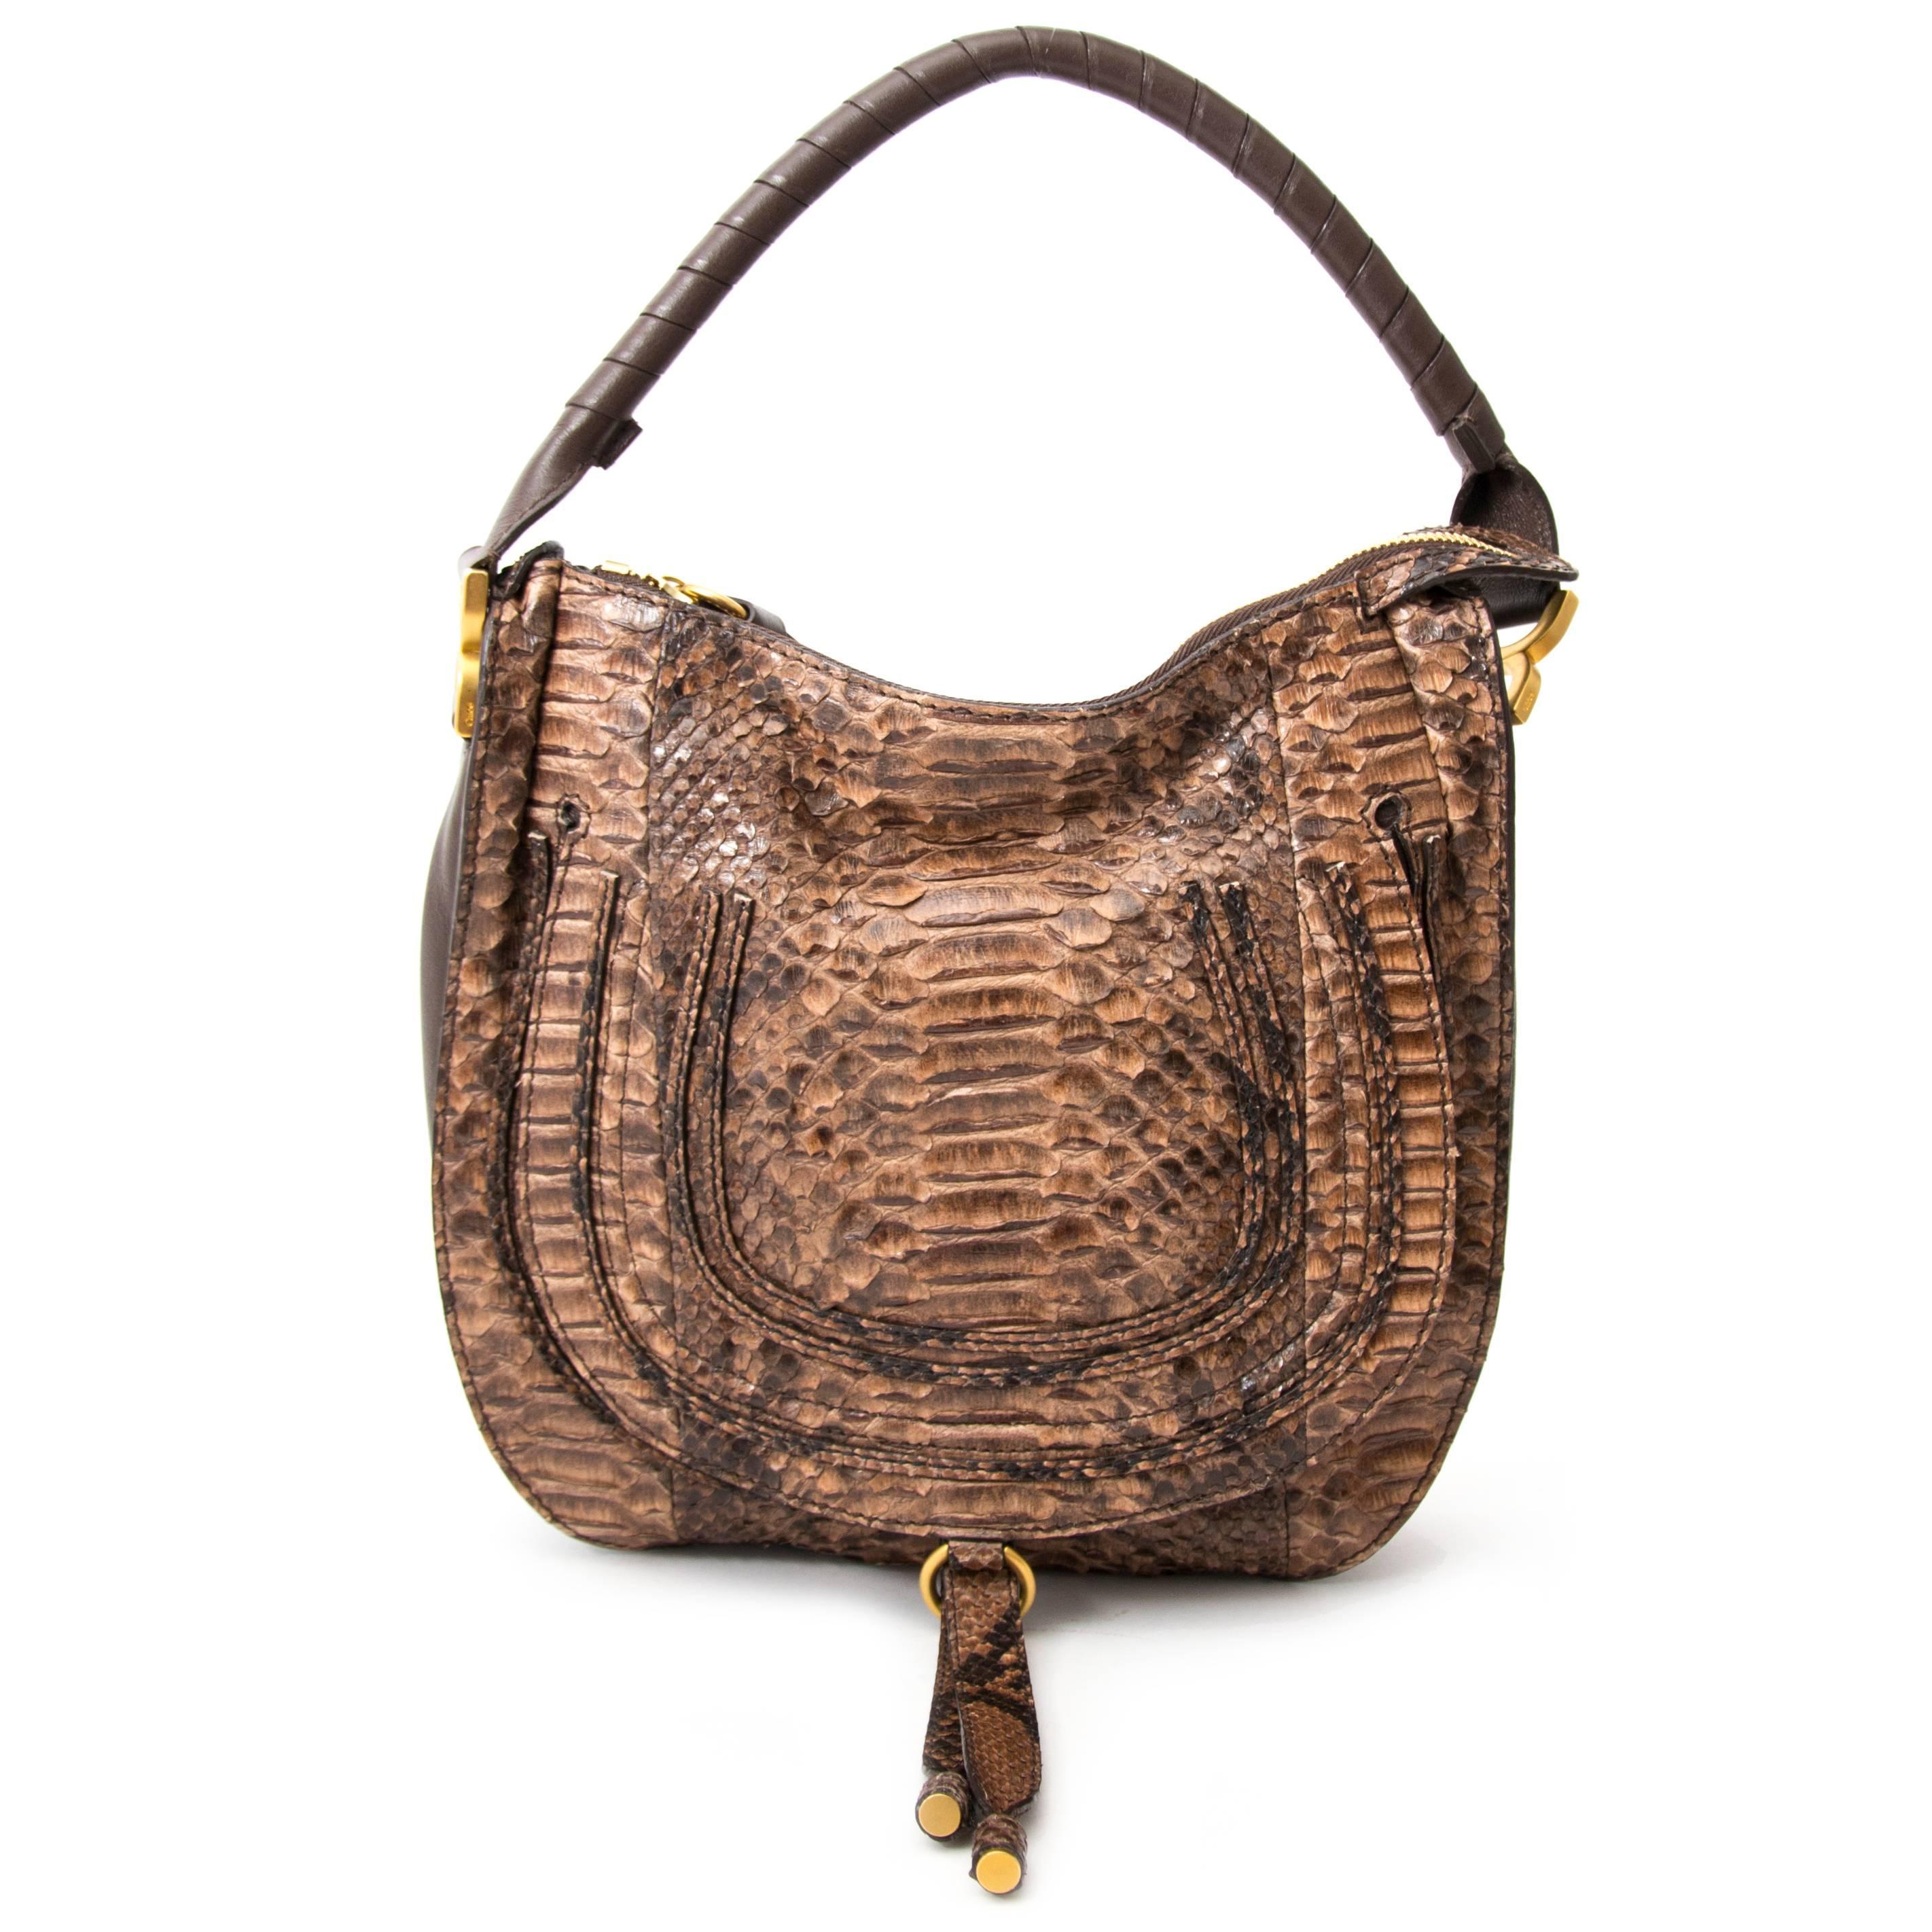 Chloé Python Marcie Satchel Bag For Sale at 1stdibs bc4108870912